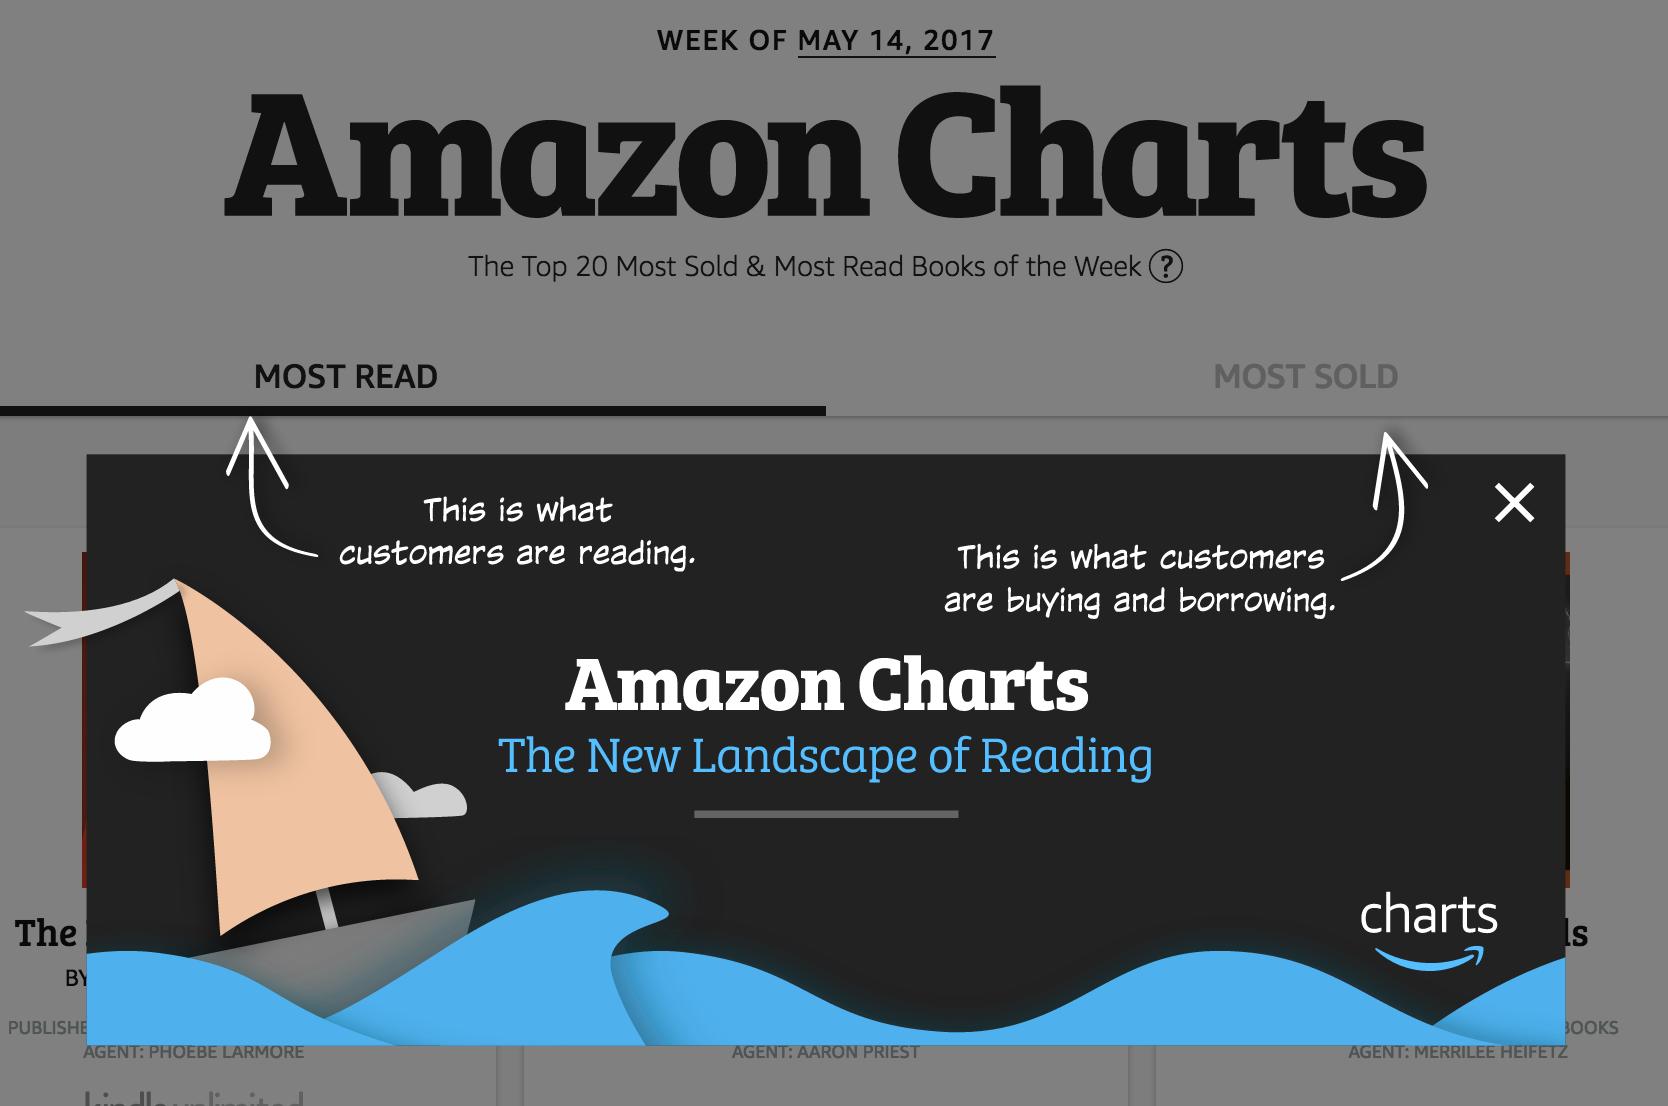 Amazon Charts, Amazon's new bestseller list, ranks titles by